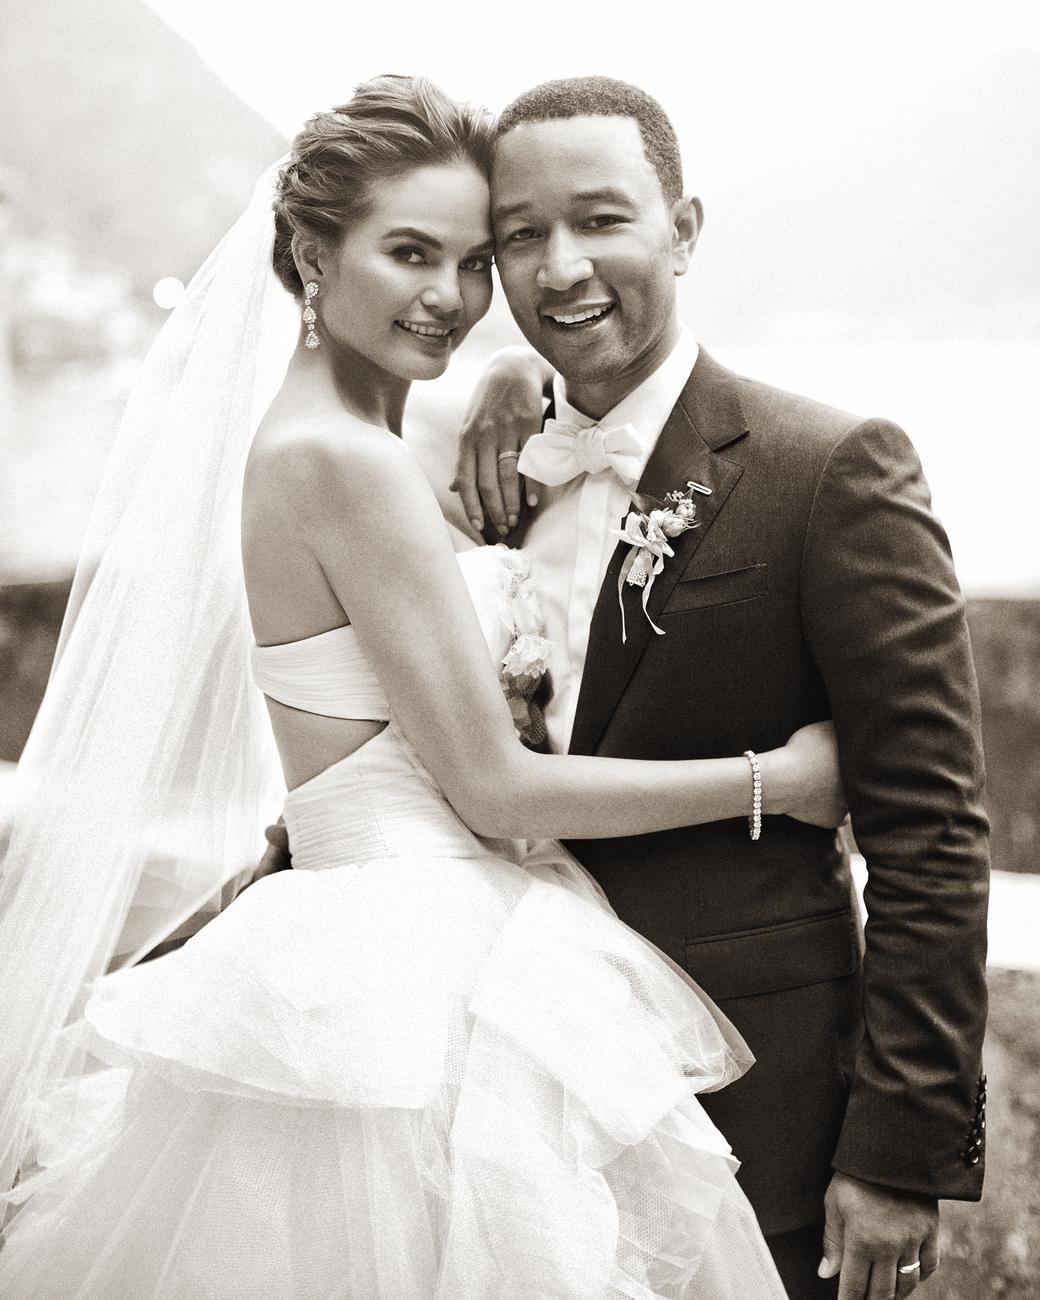 Chrissy Teigen Wedding Mistakes